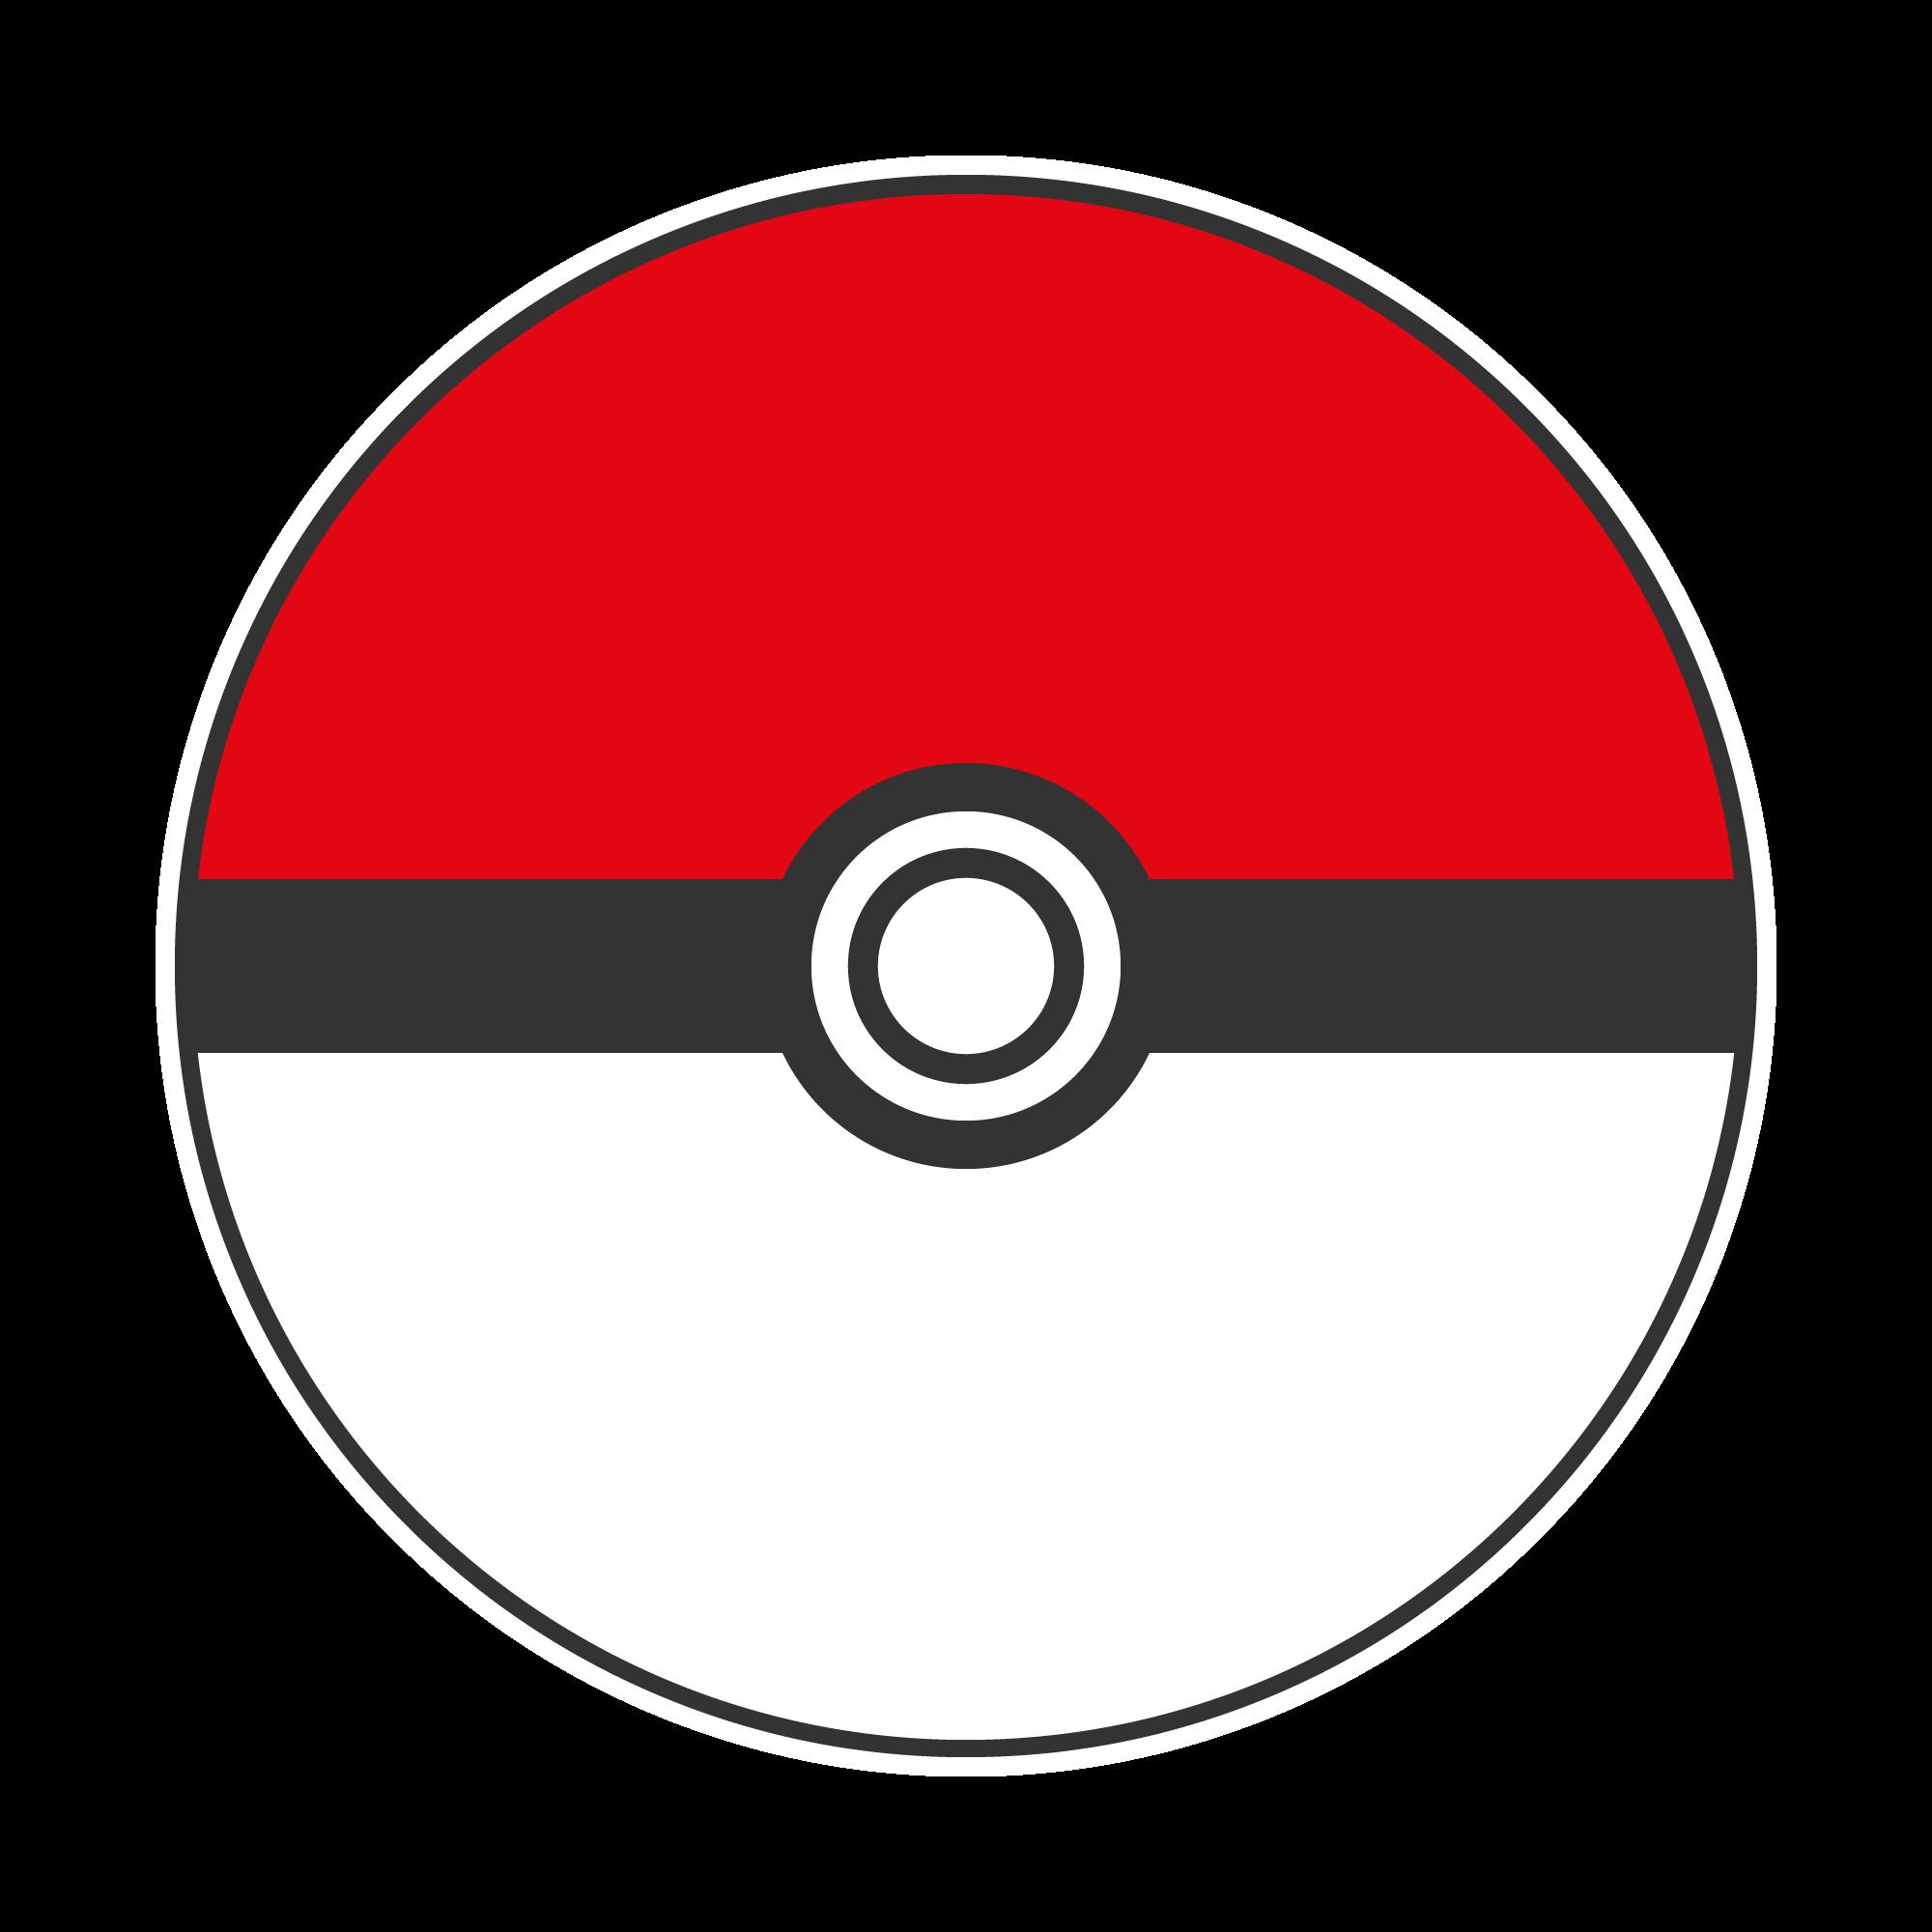 Drawn pokeball shadow Pokemon PNG free images PNG